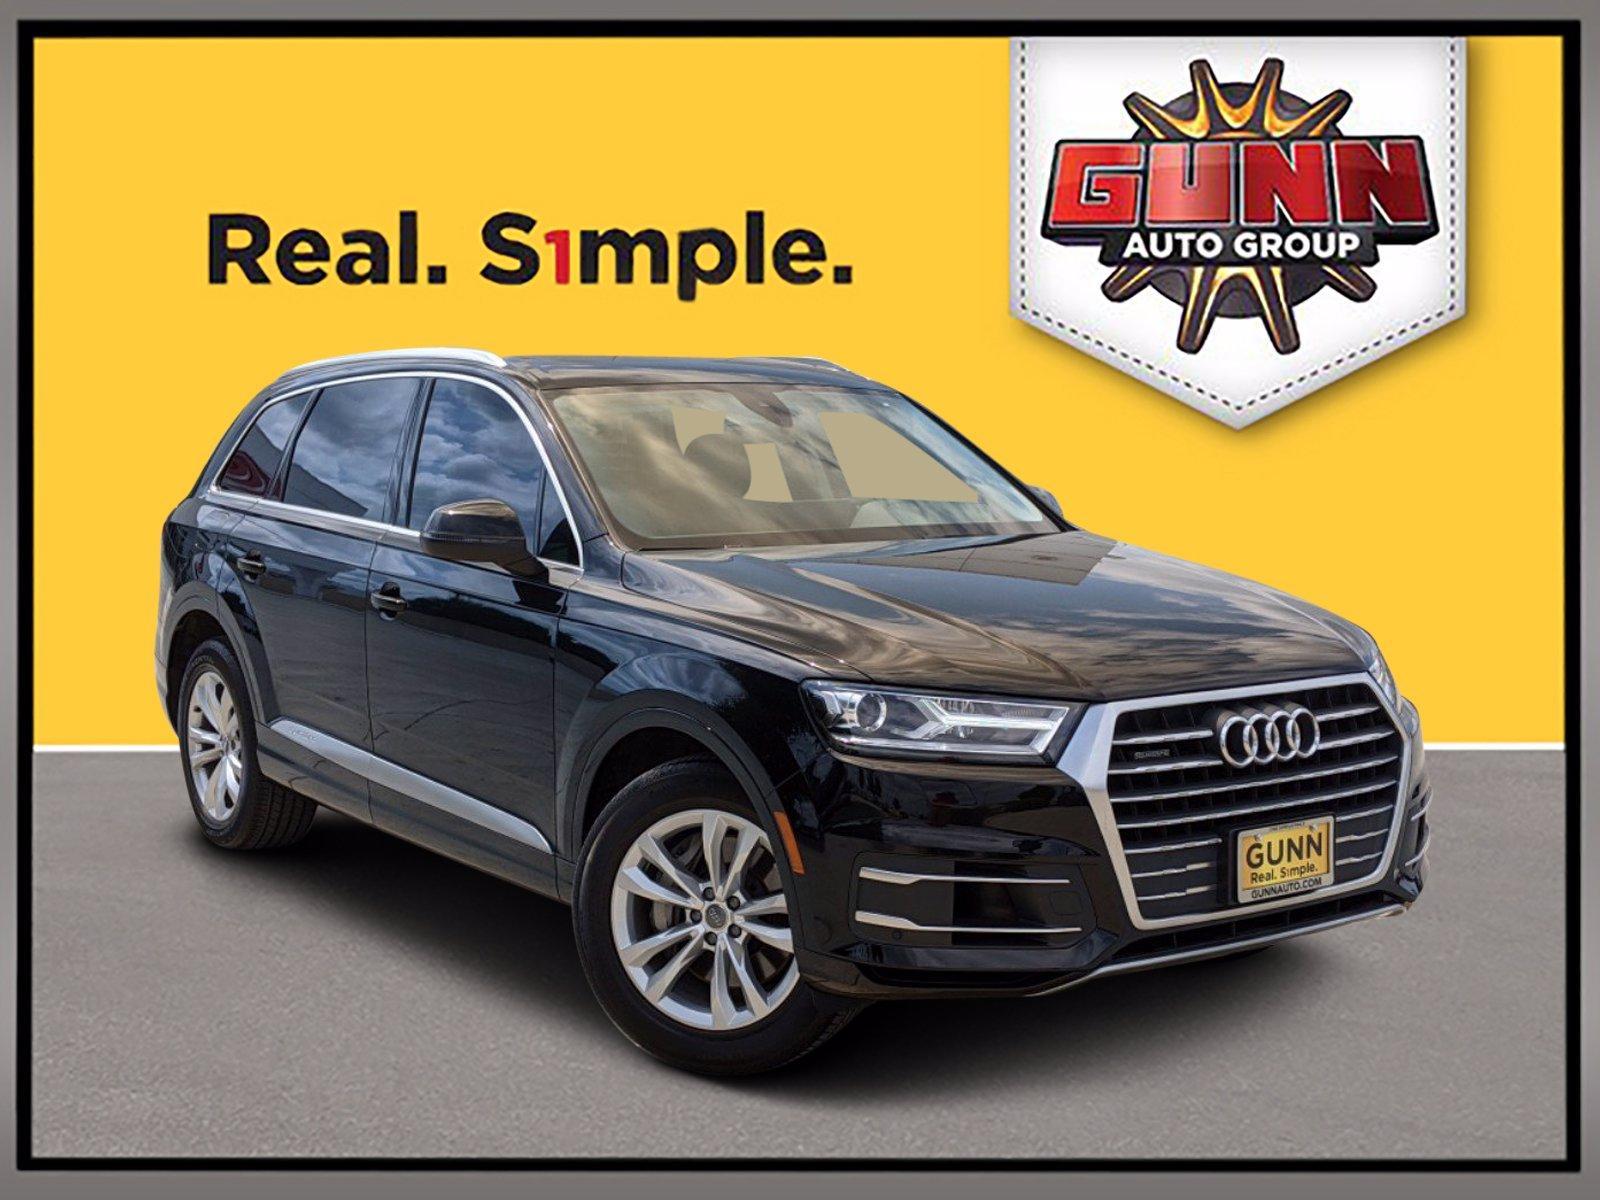 2018 Audi Q7 Vehicle Photo in Selma, TX 78154